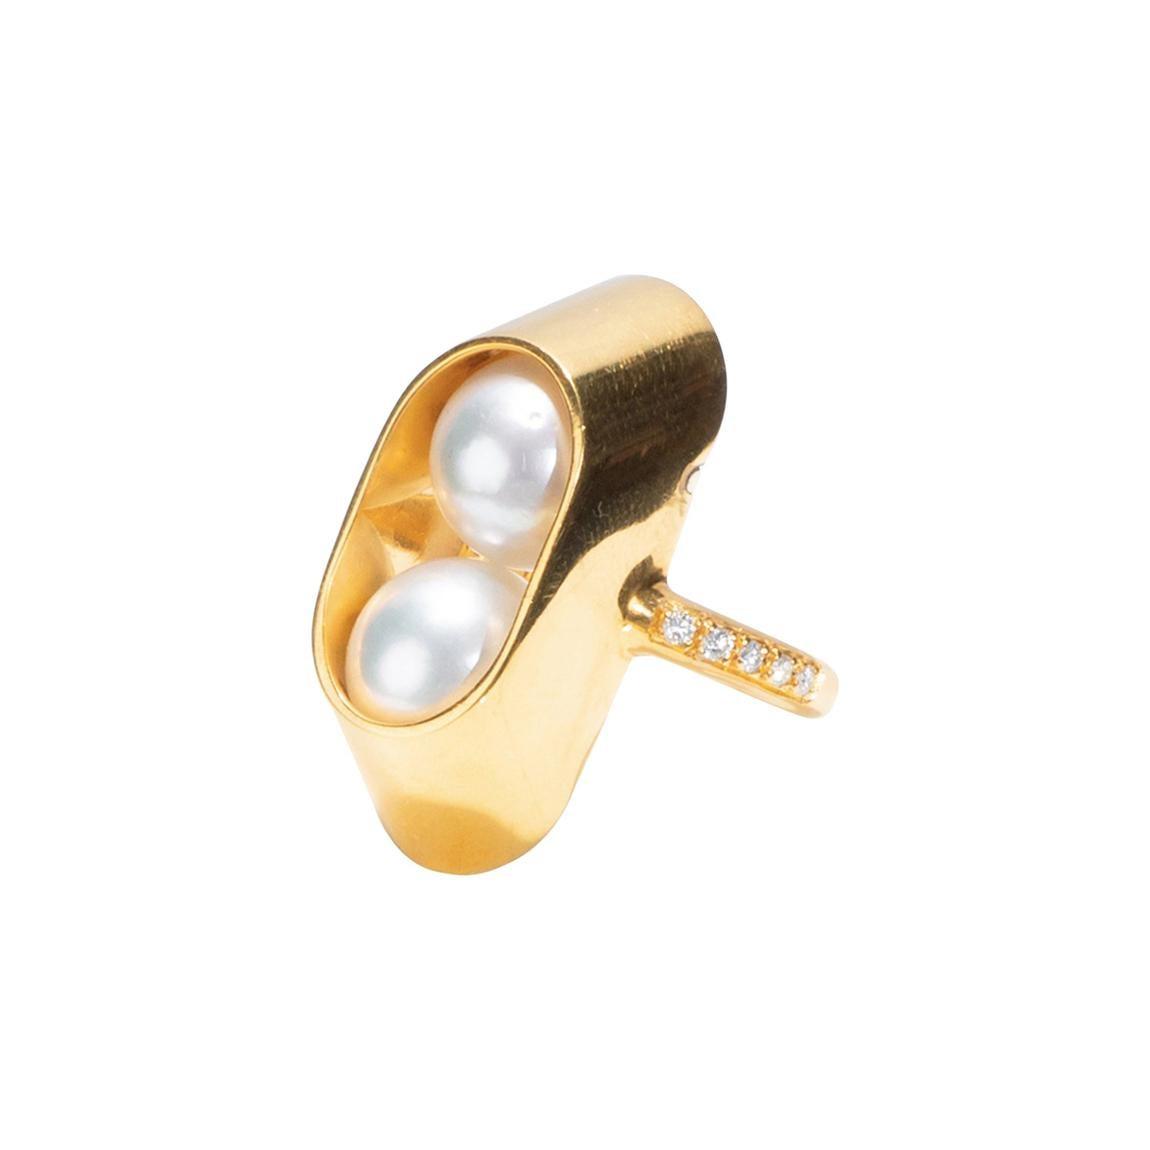 18 Karat Yellow Gold, Diamonds, South Sea Pearls Cocoon Large Ring